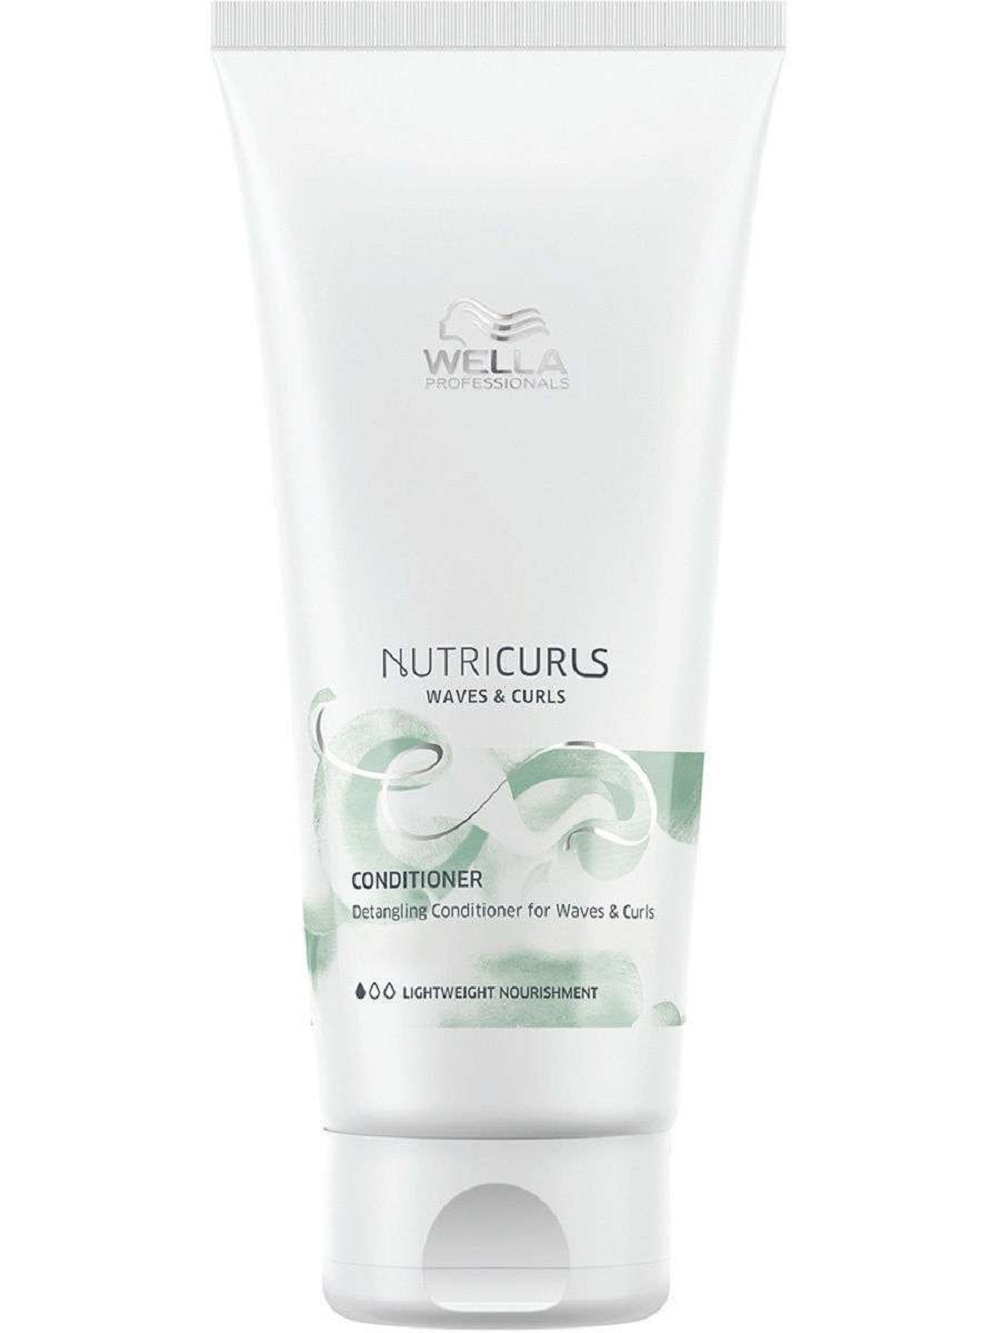 NutriCurls Detangling Conditioner for Curls & Waves